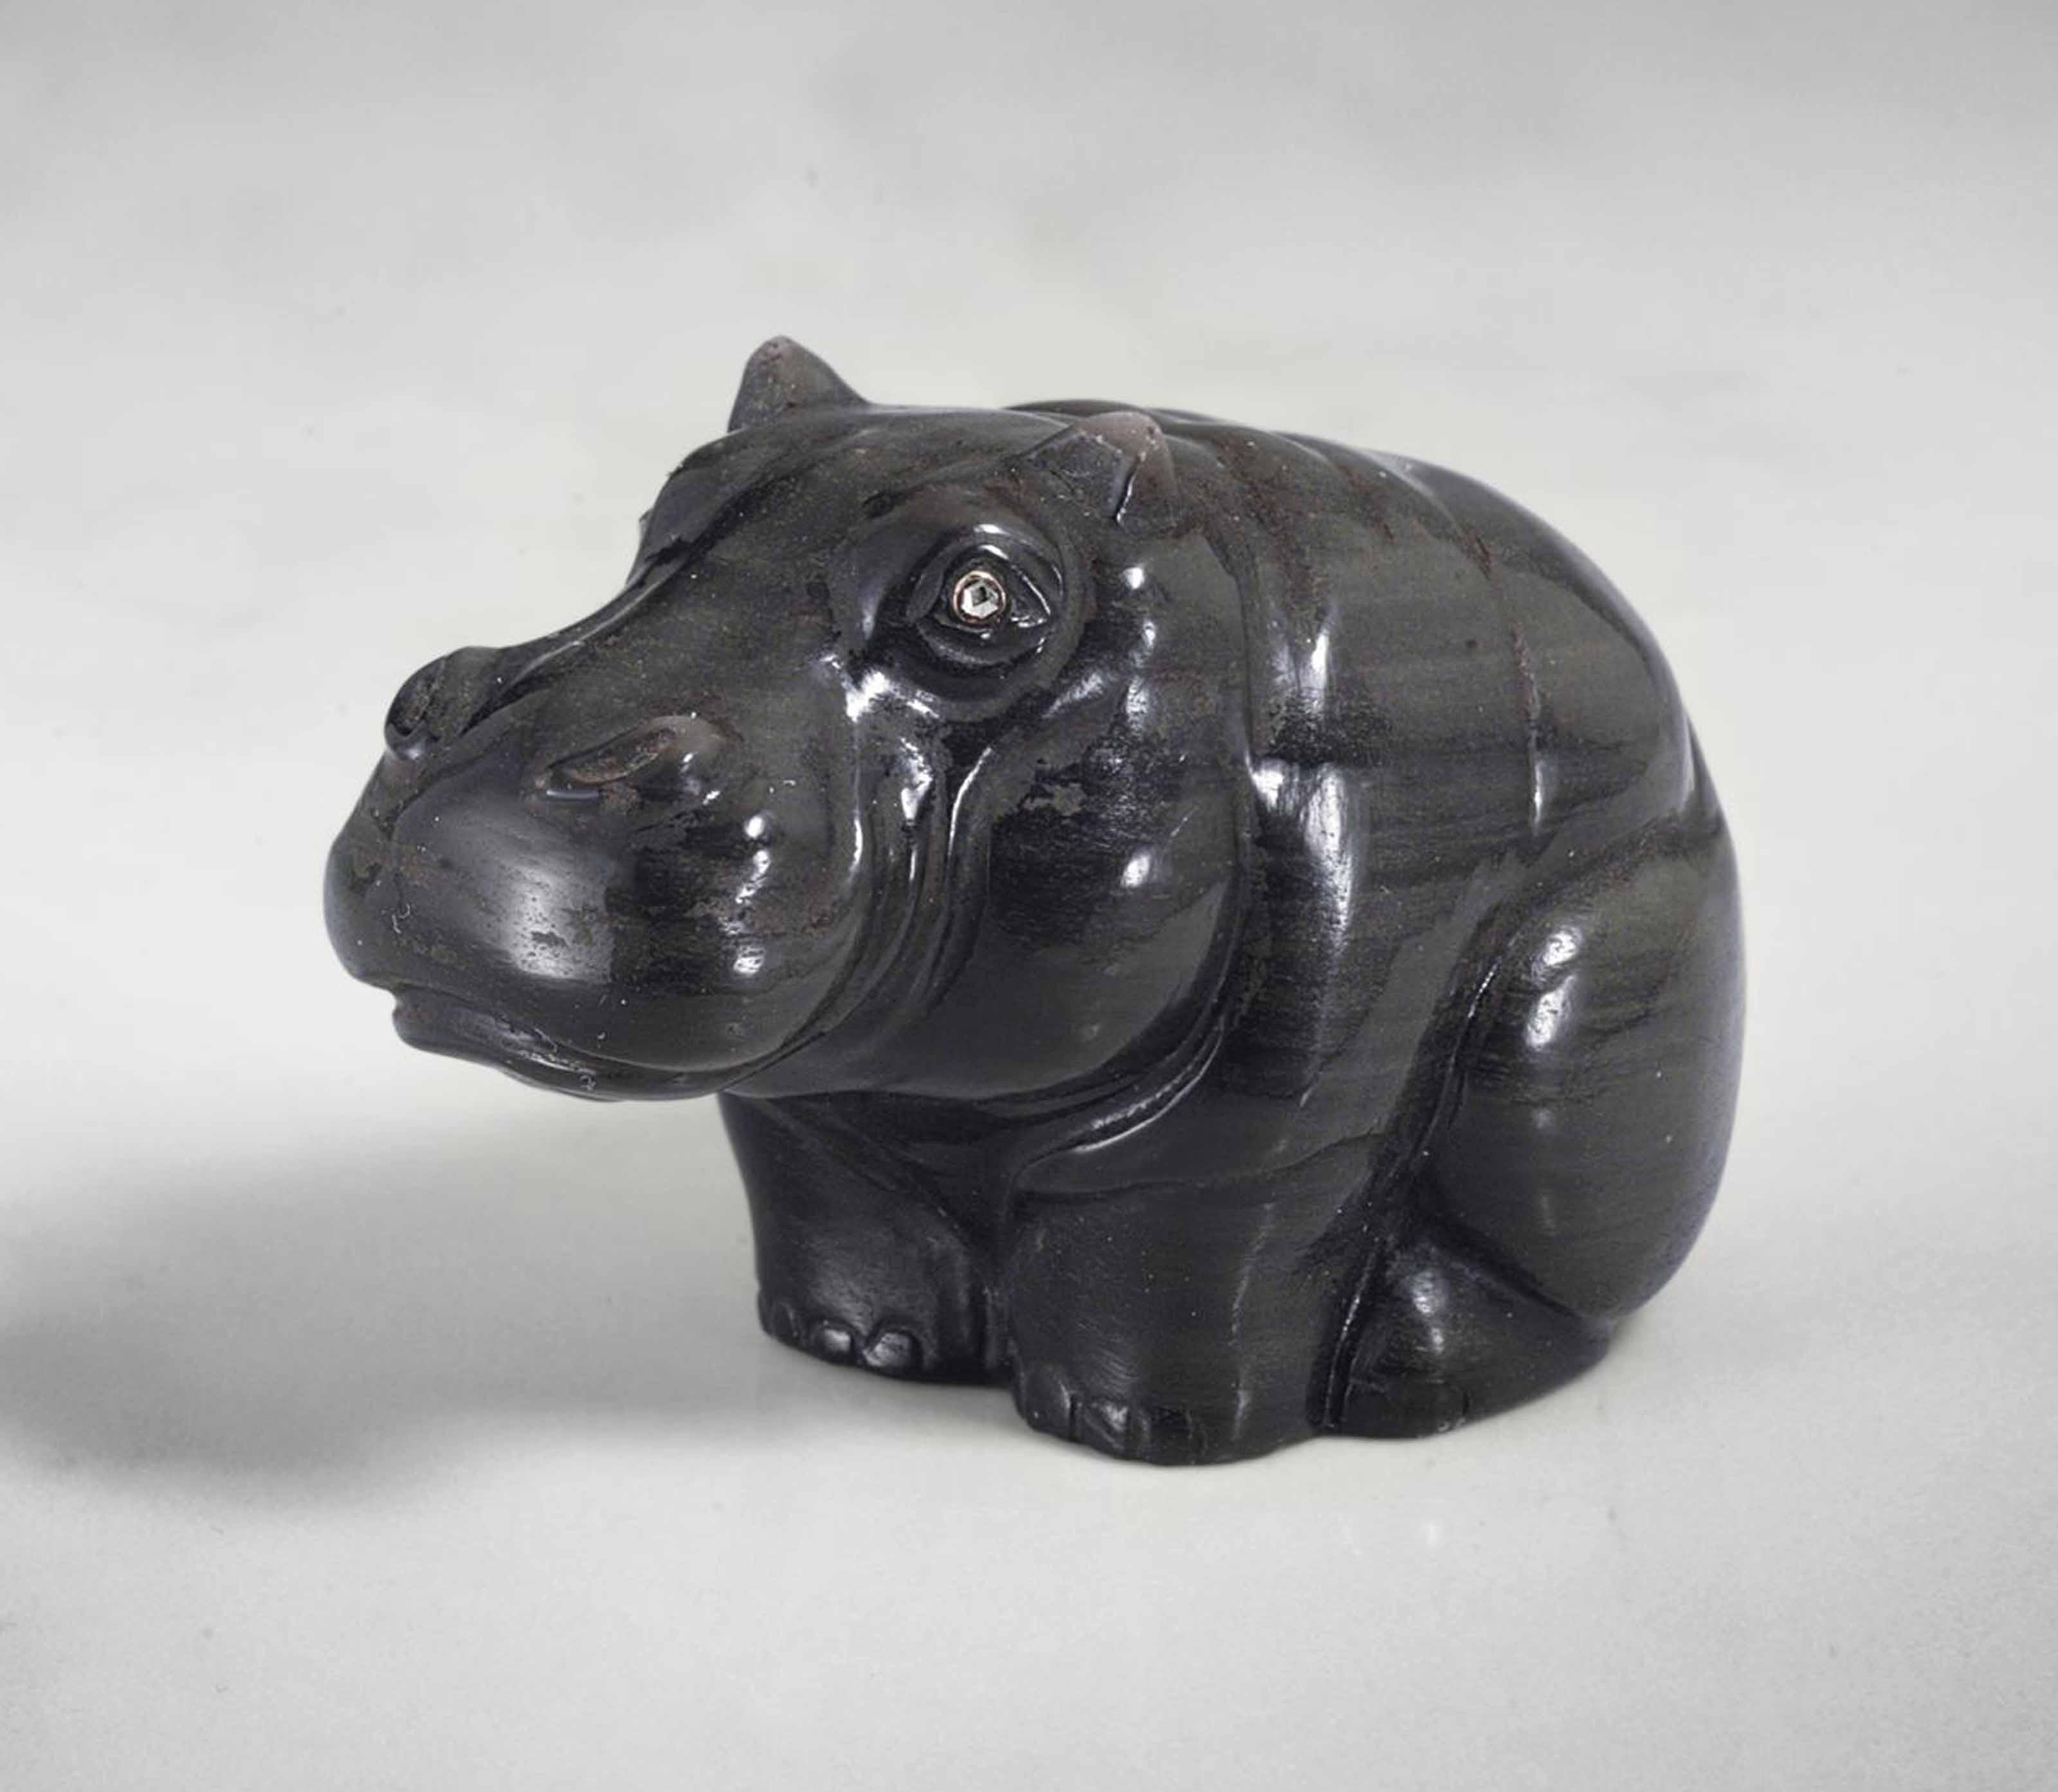 AN OBSIDIAN MODEL OF A HIPPOPO